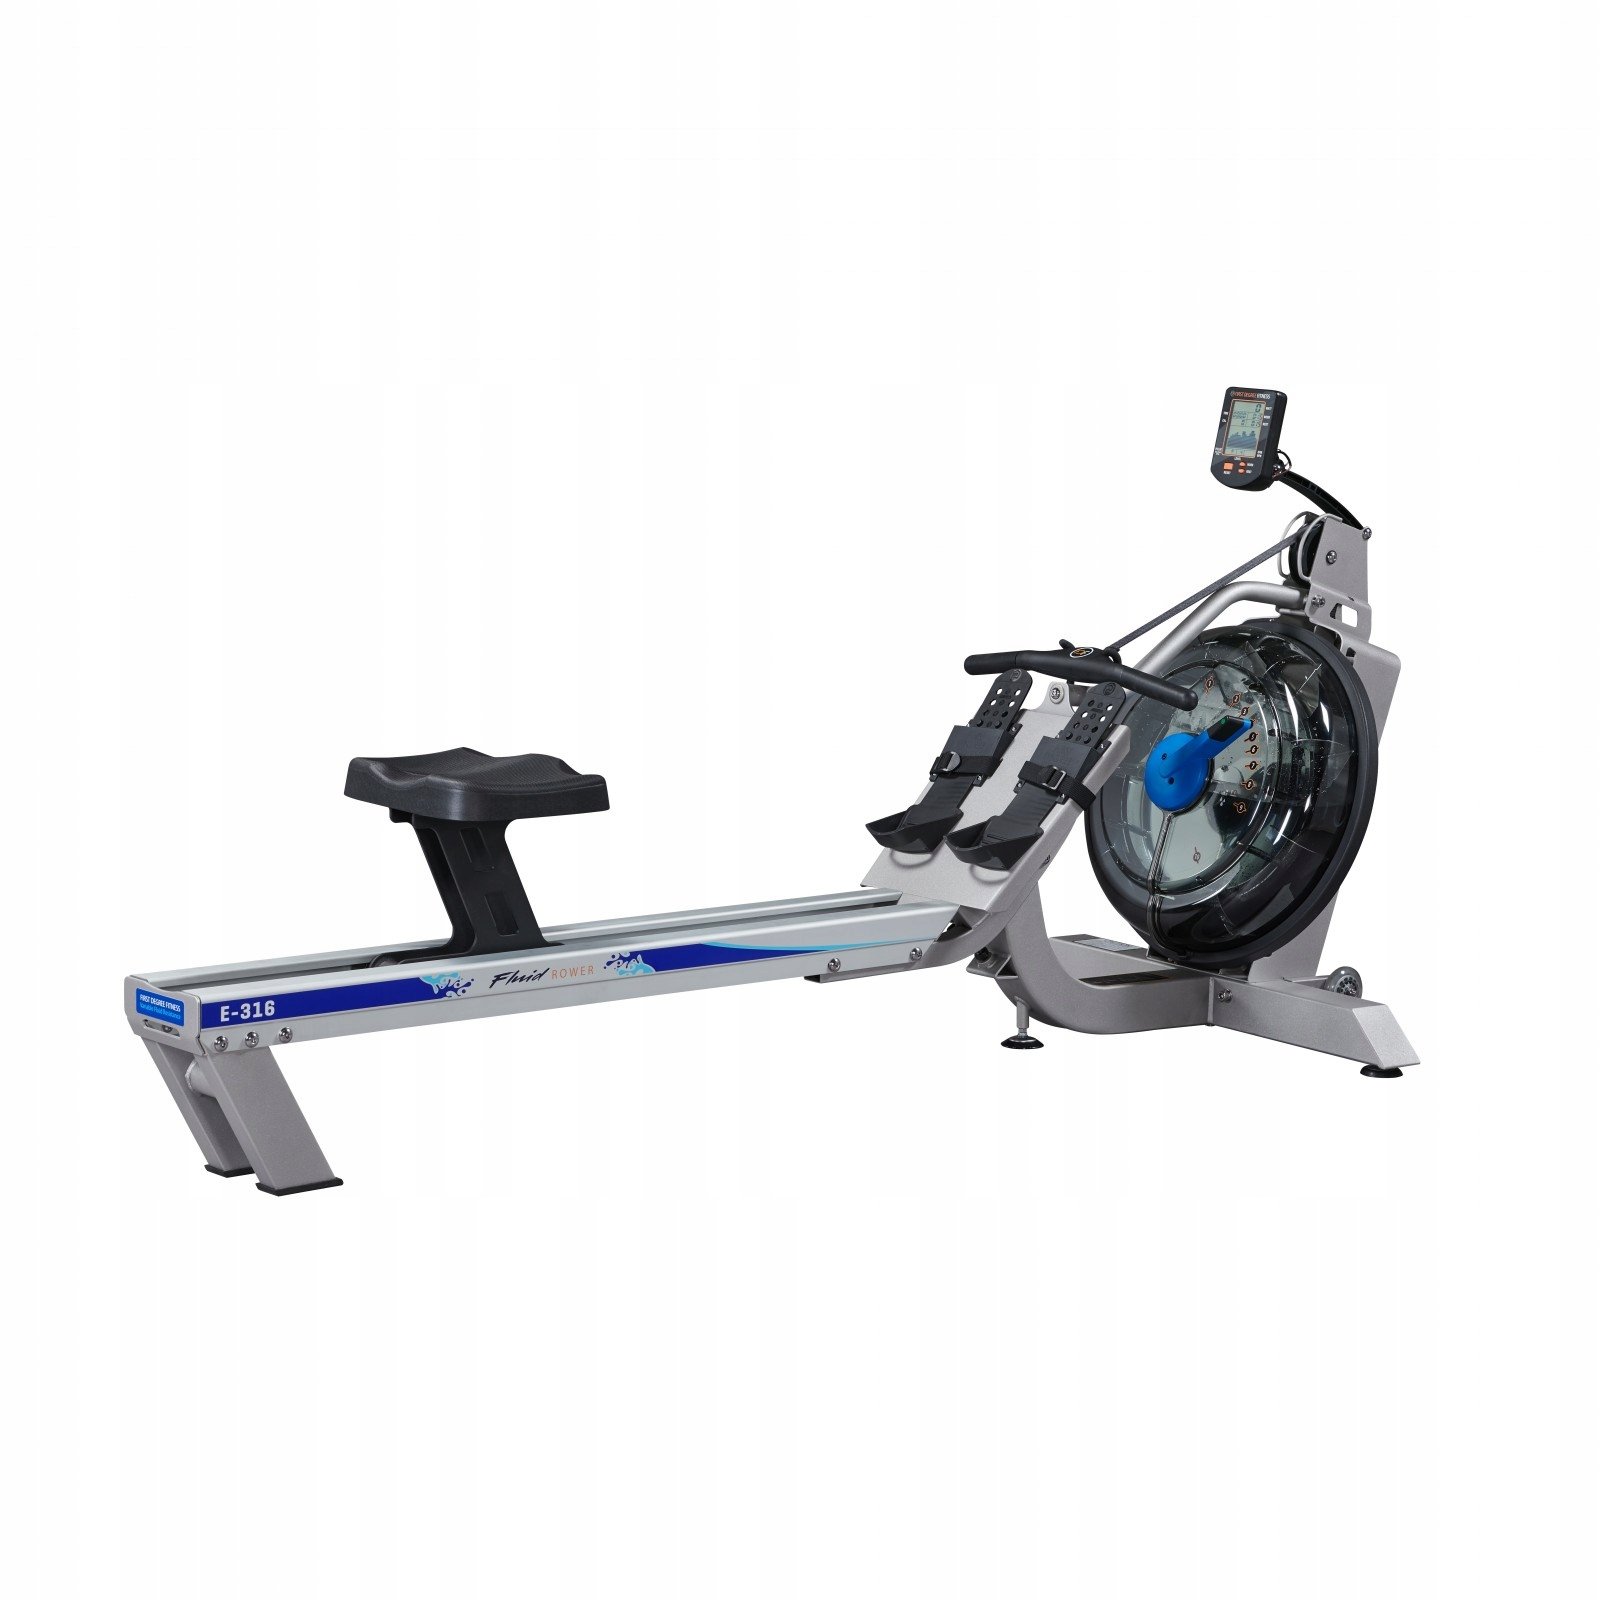 ROY ROWER Prvý titul Fluid Bike E316